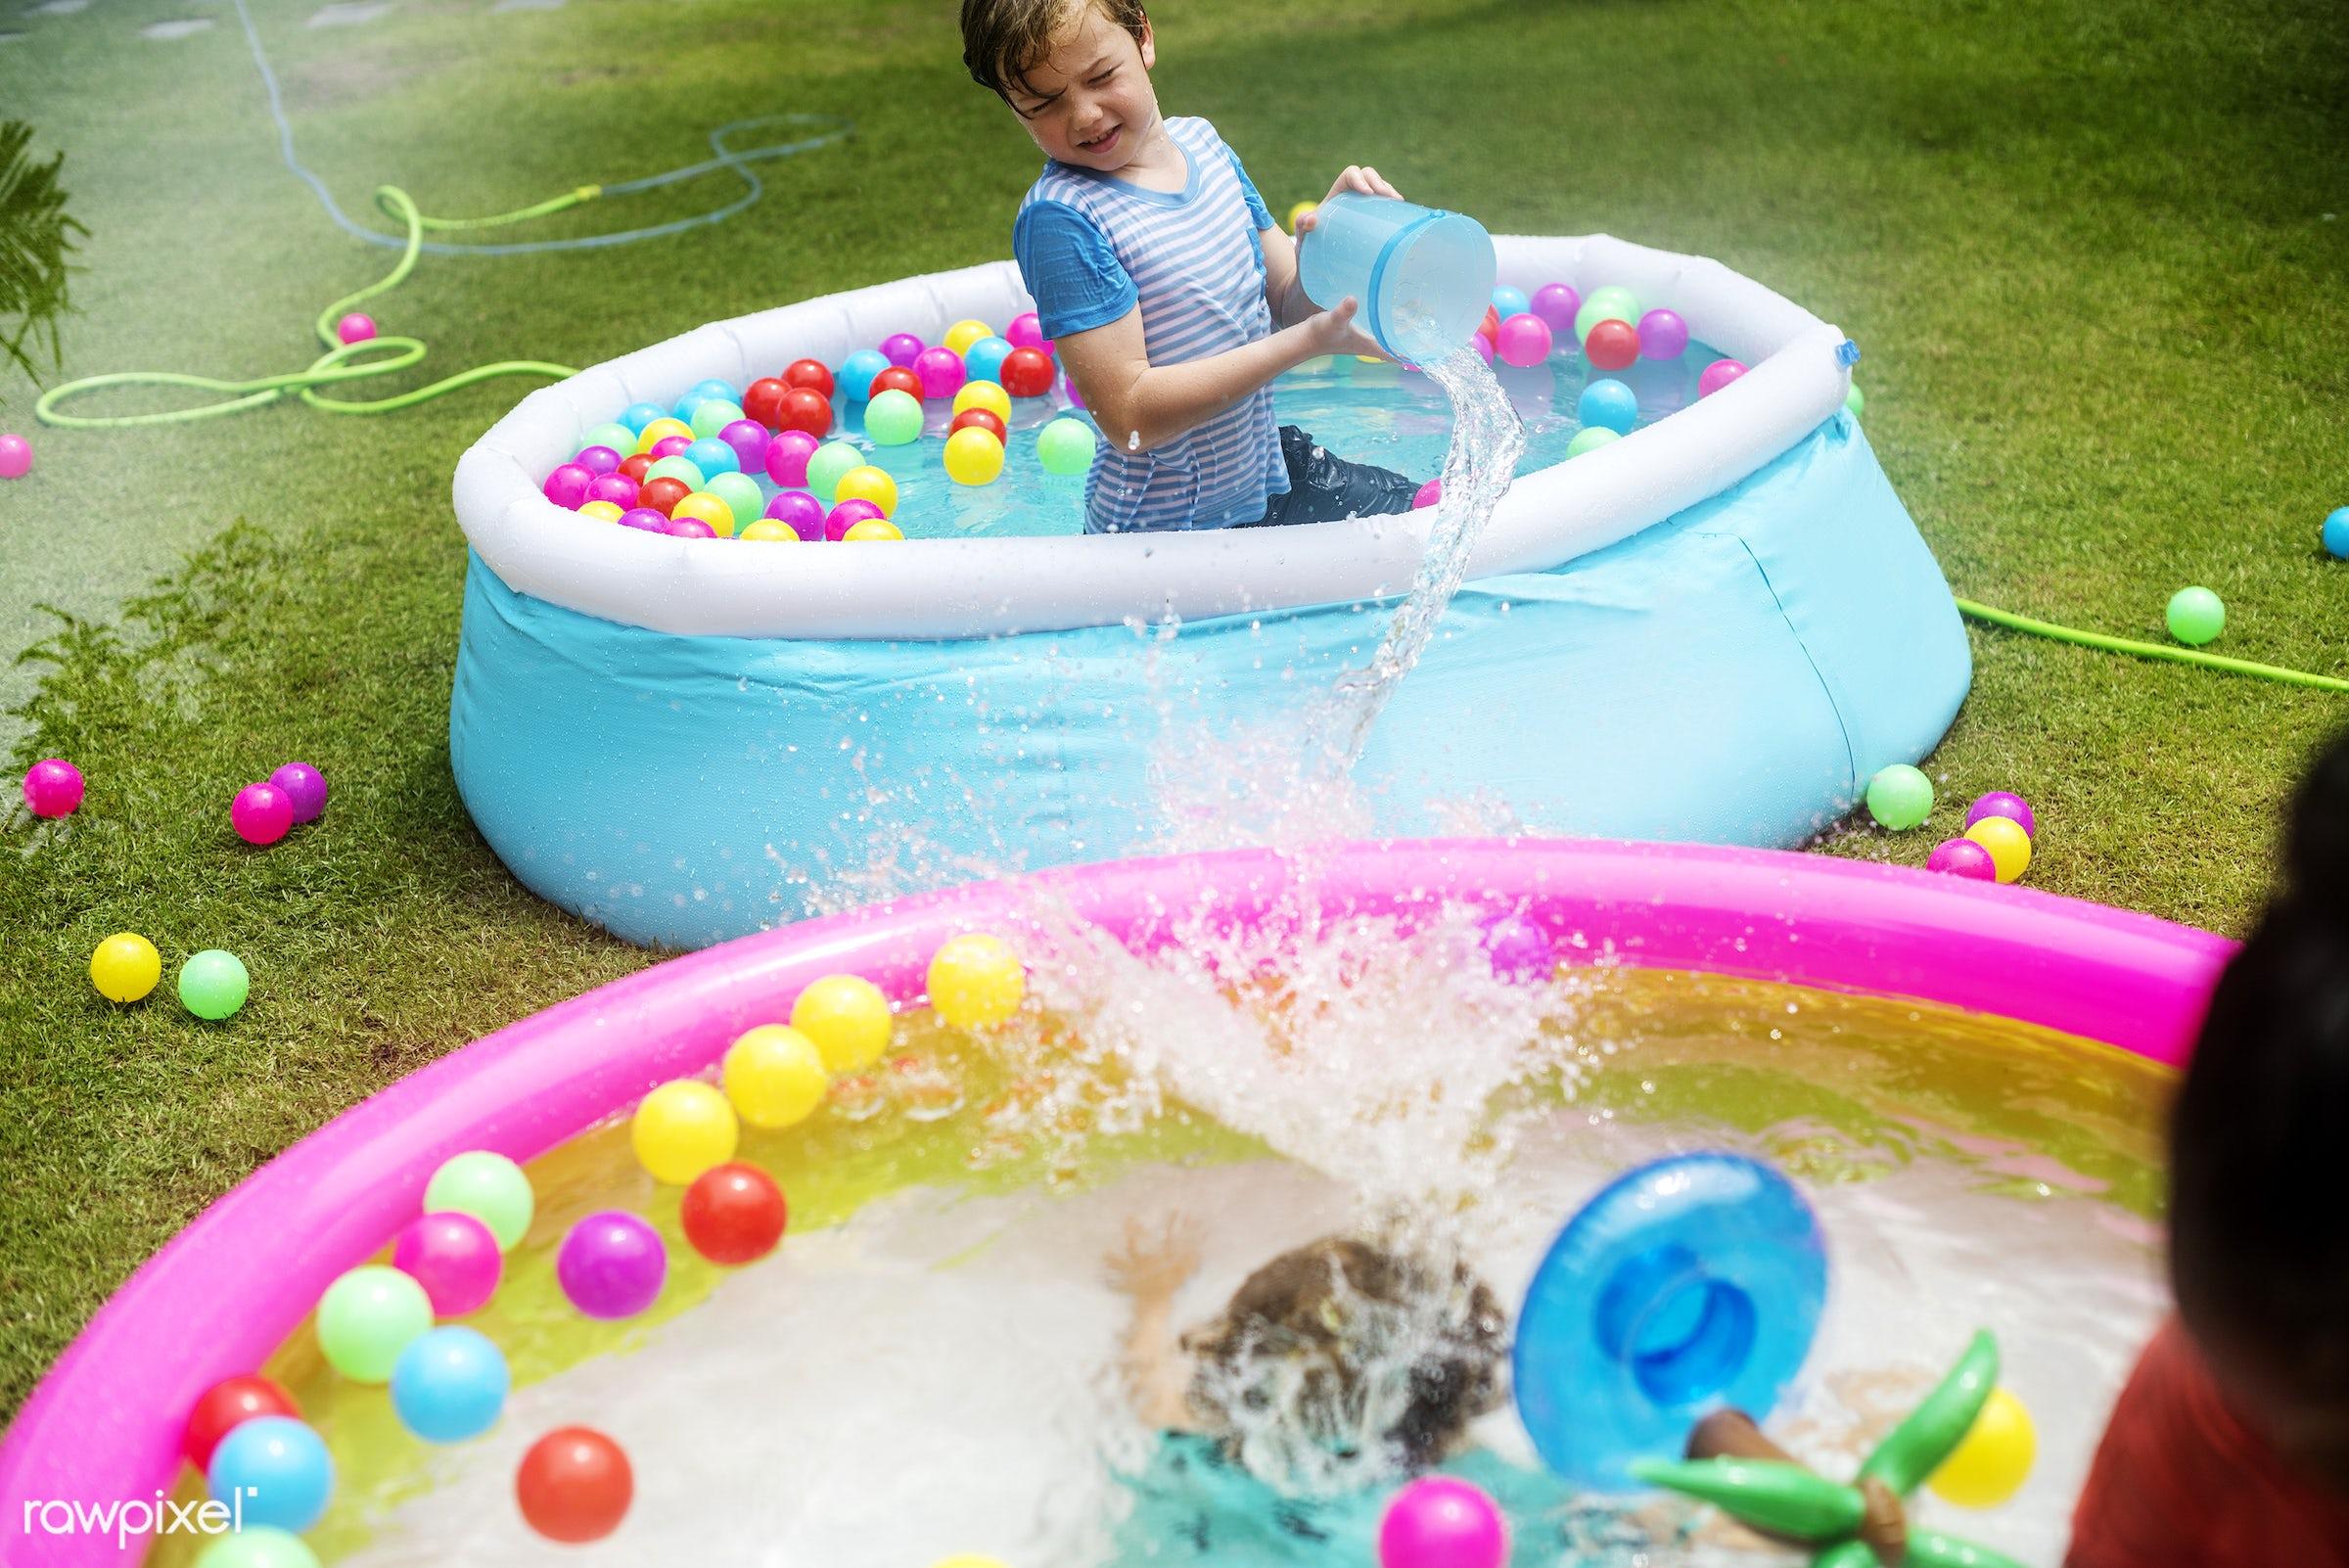 backyard, boy, cheerful, child, childhood, enjoying, fun, holiday, inflatable pool, kid, leisure, outdoors, park, plastic...